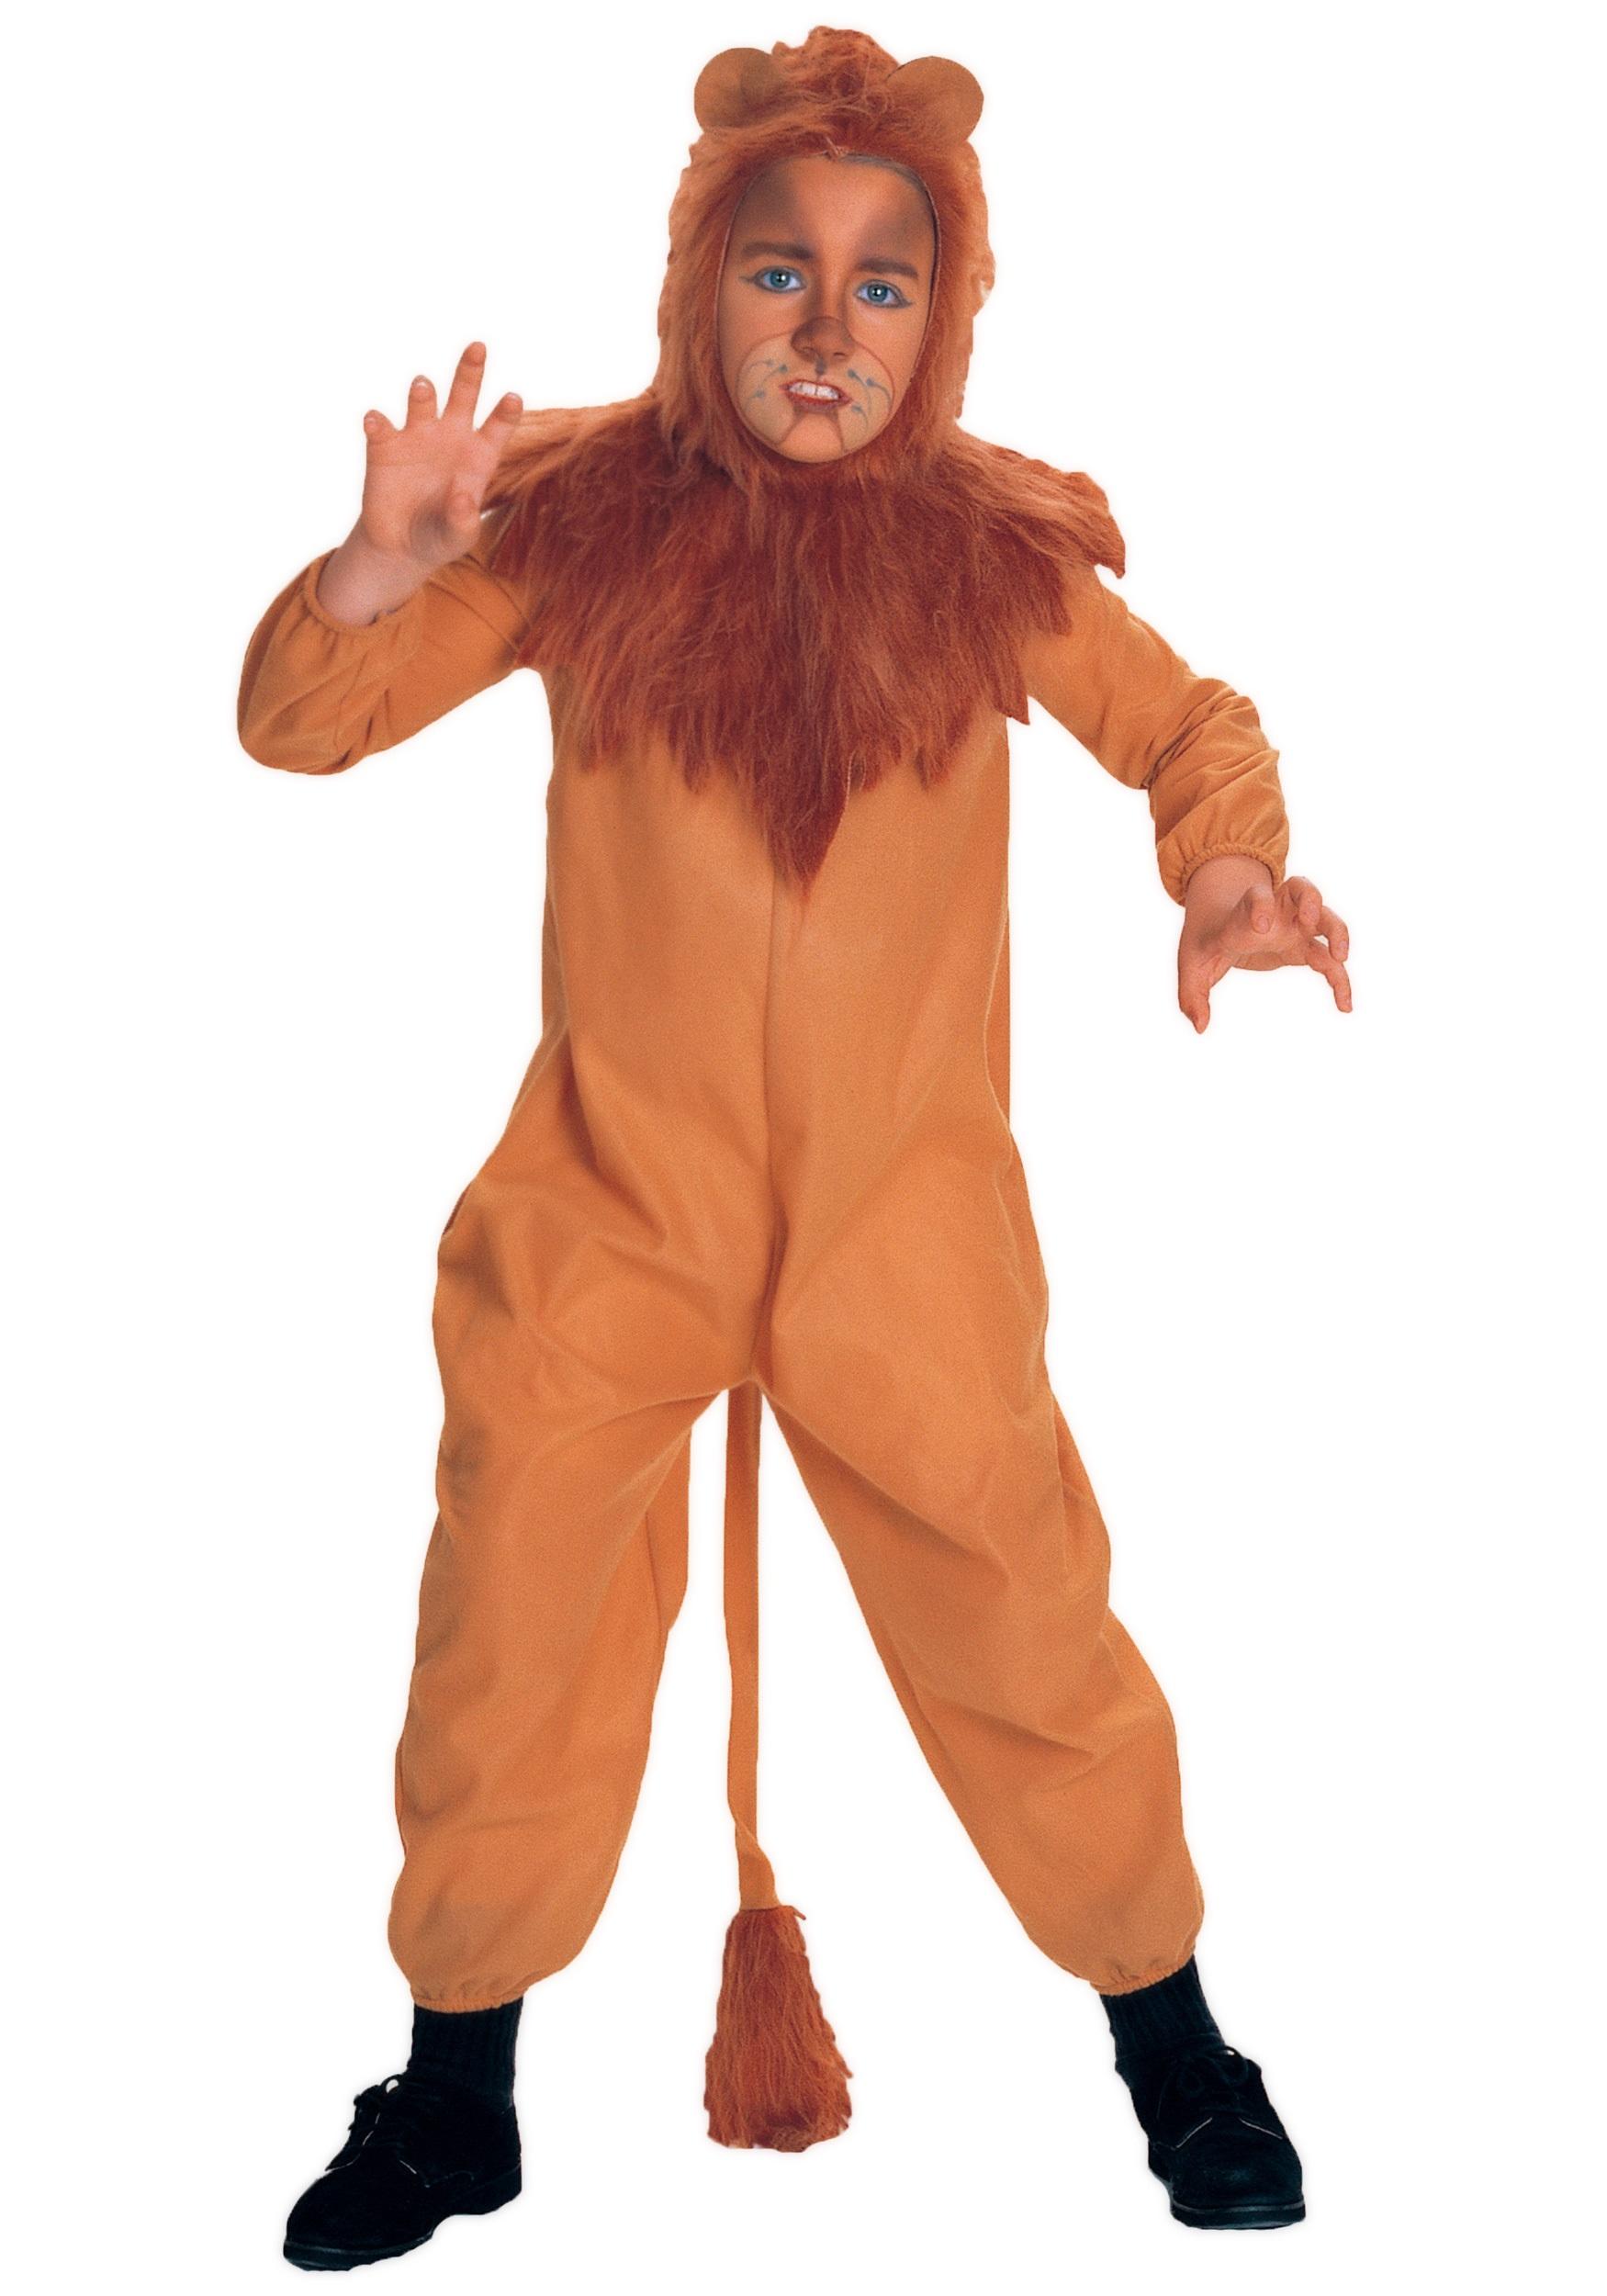 Cowardly Lion Costume - Adult, Kids Cowardly Lion Costumes